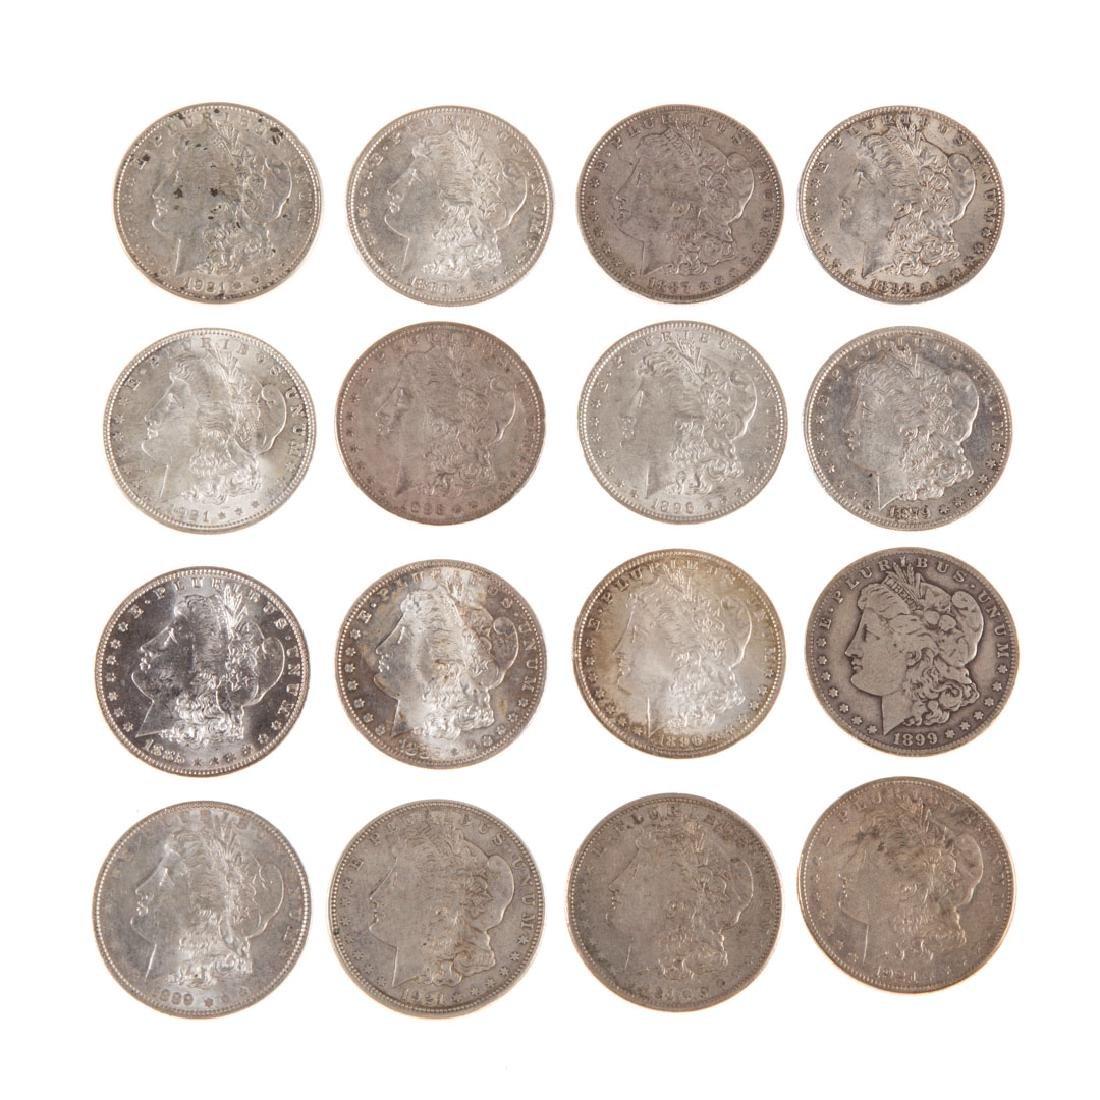 [US] Sixteen Morgan Silver Dollars